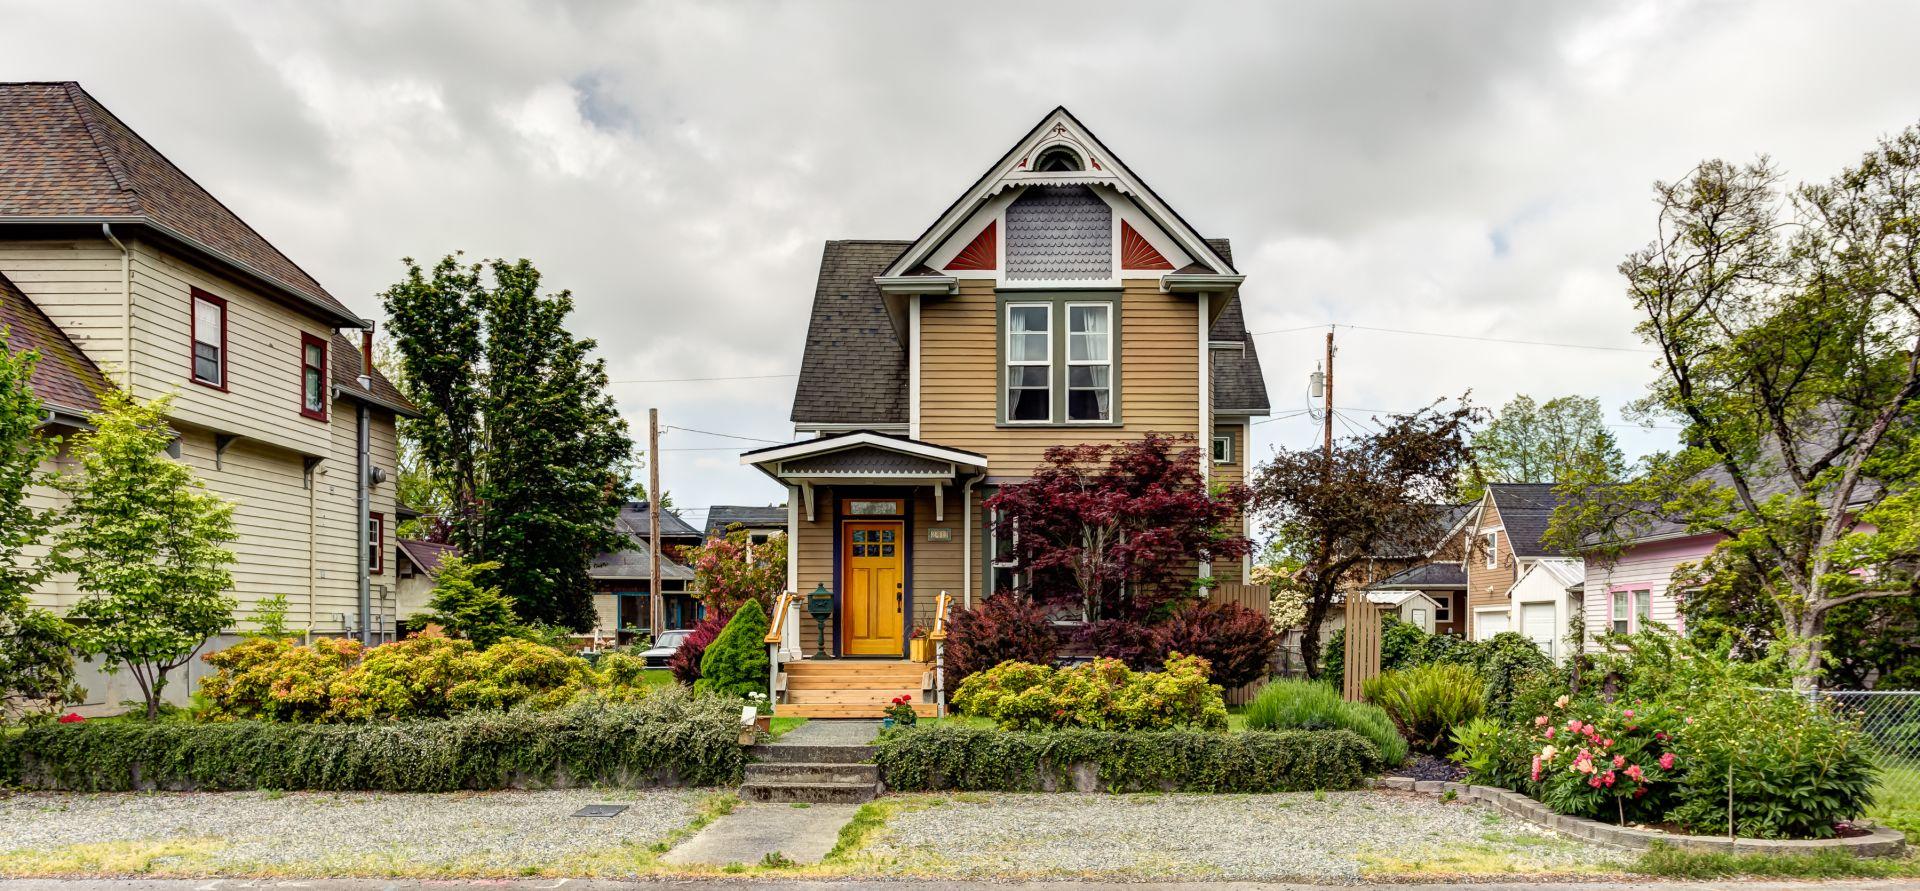 Craftsman Homes in the Columbia Neighborhood